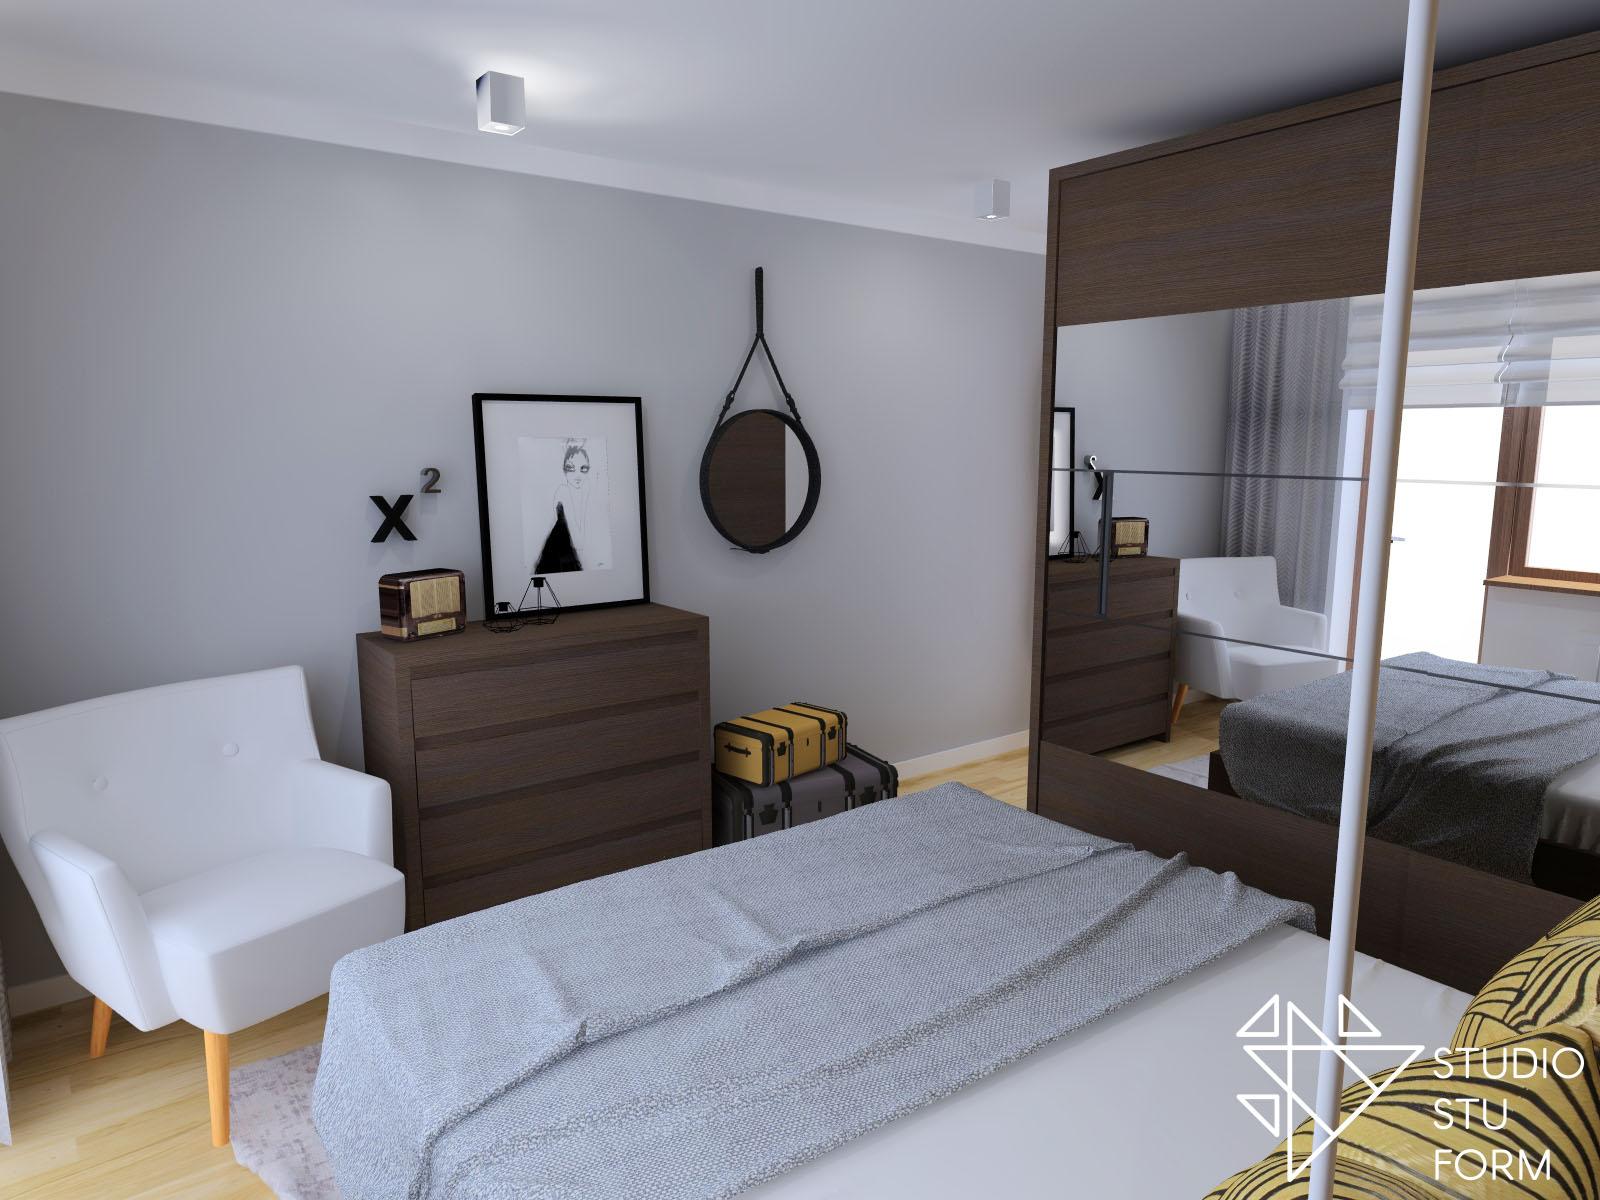 szafki w sypialni